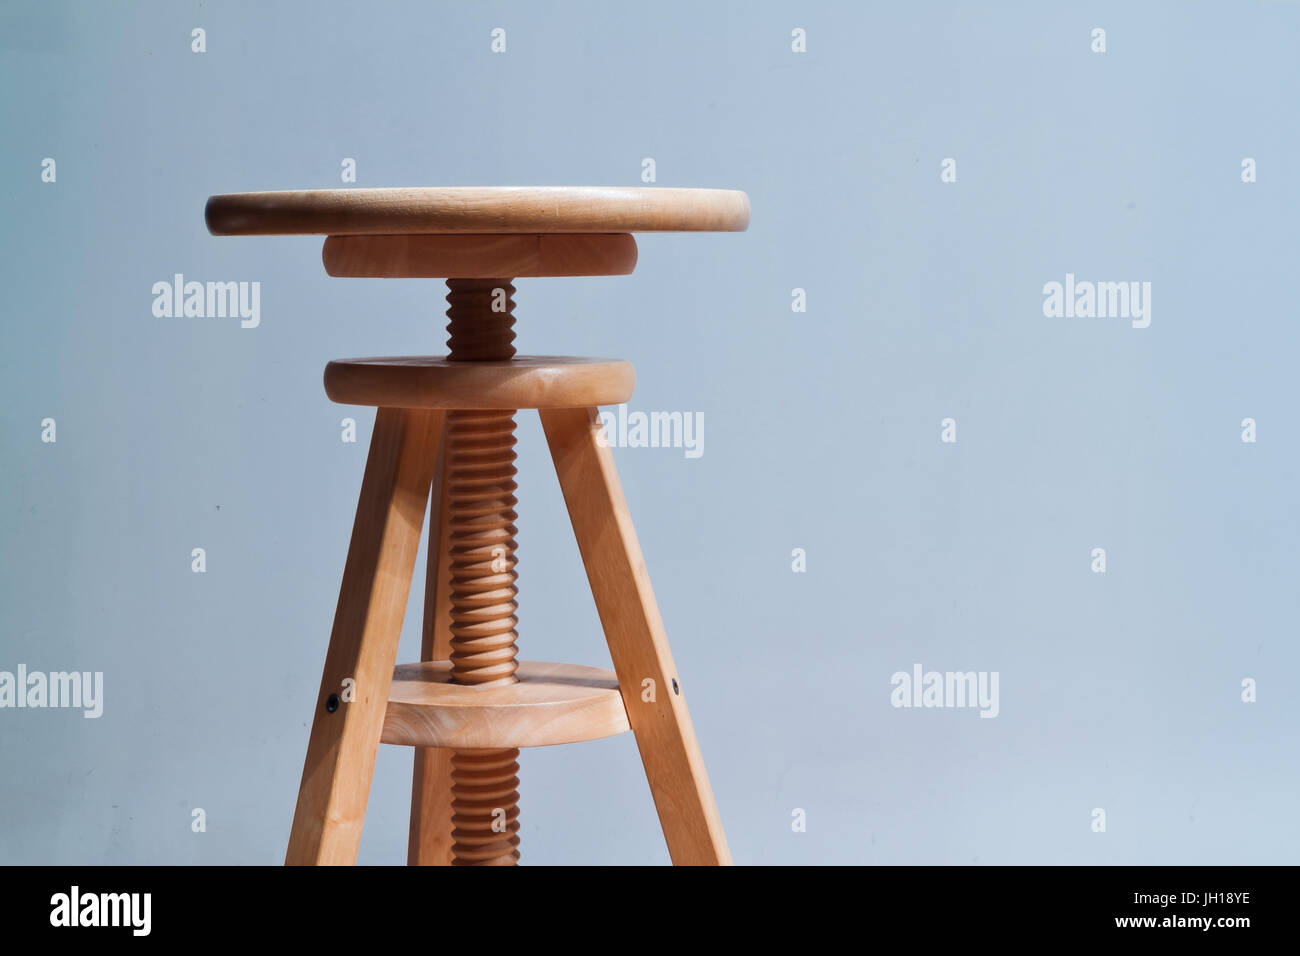 Three legged stool with adjustable seat - Stock Image